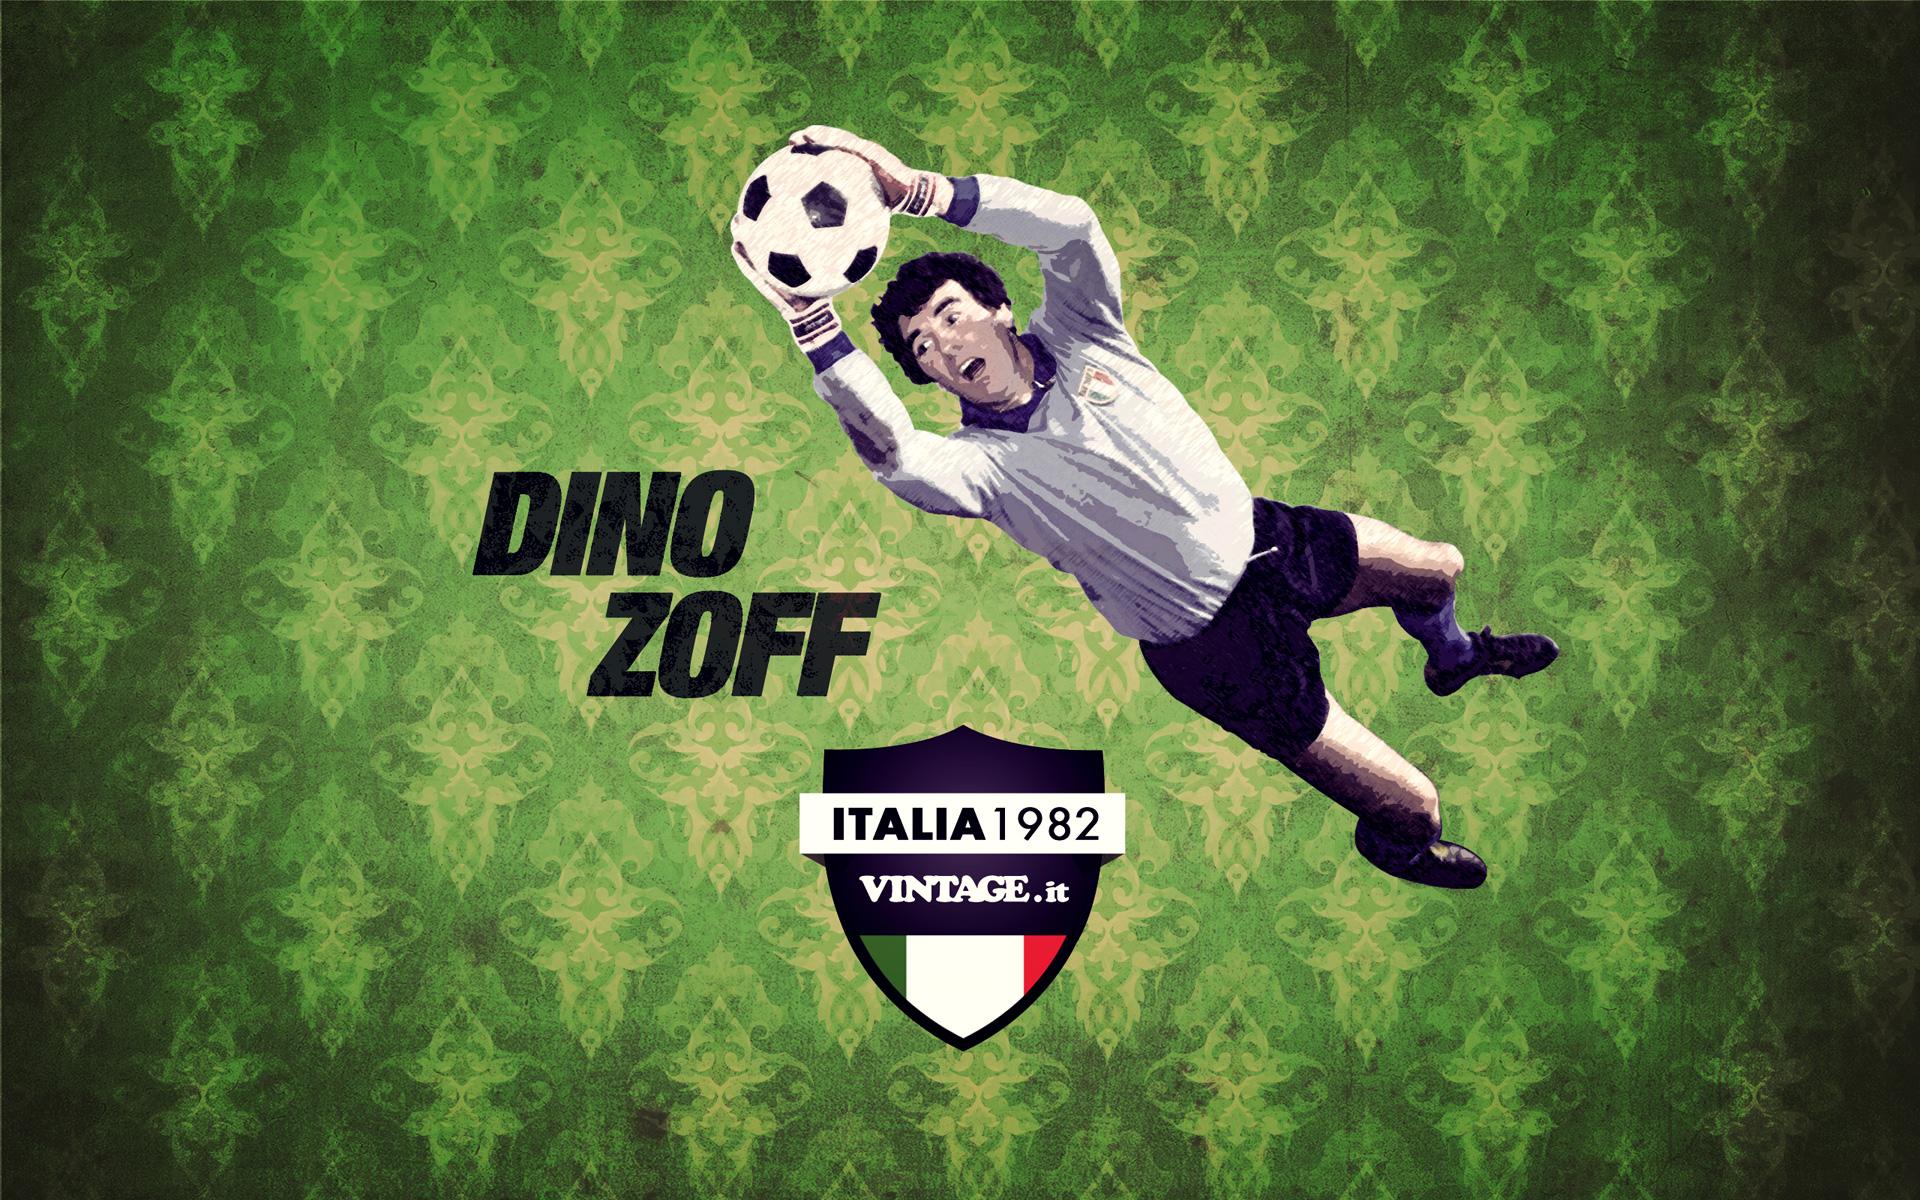 Dino Zoff wallpaper campioni collection Free Desktop HD iPad